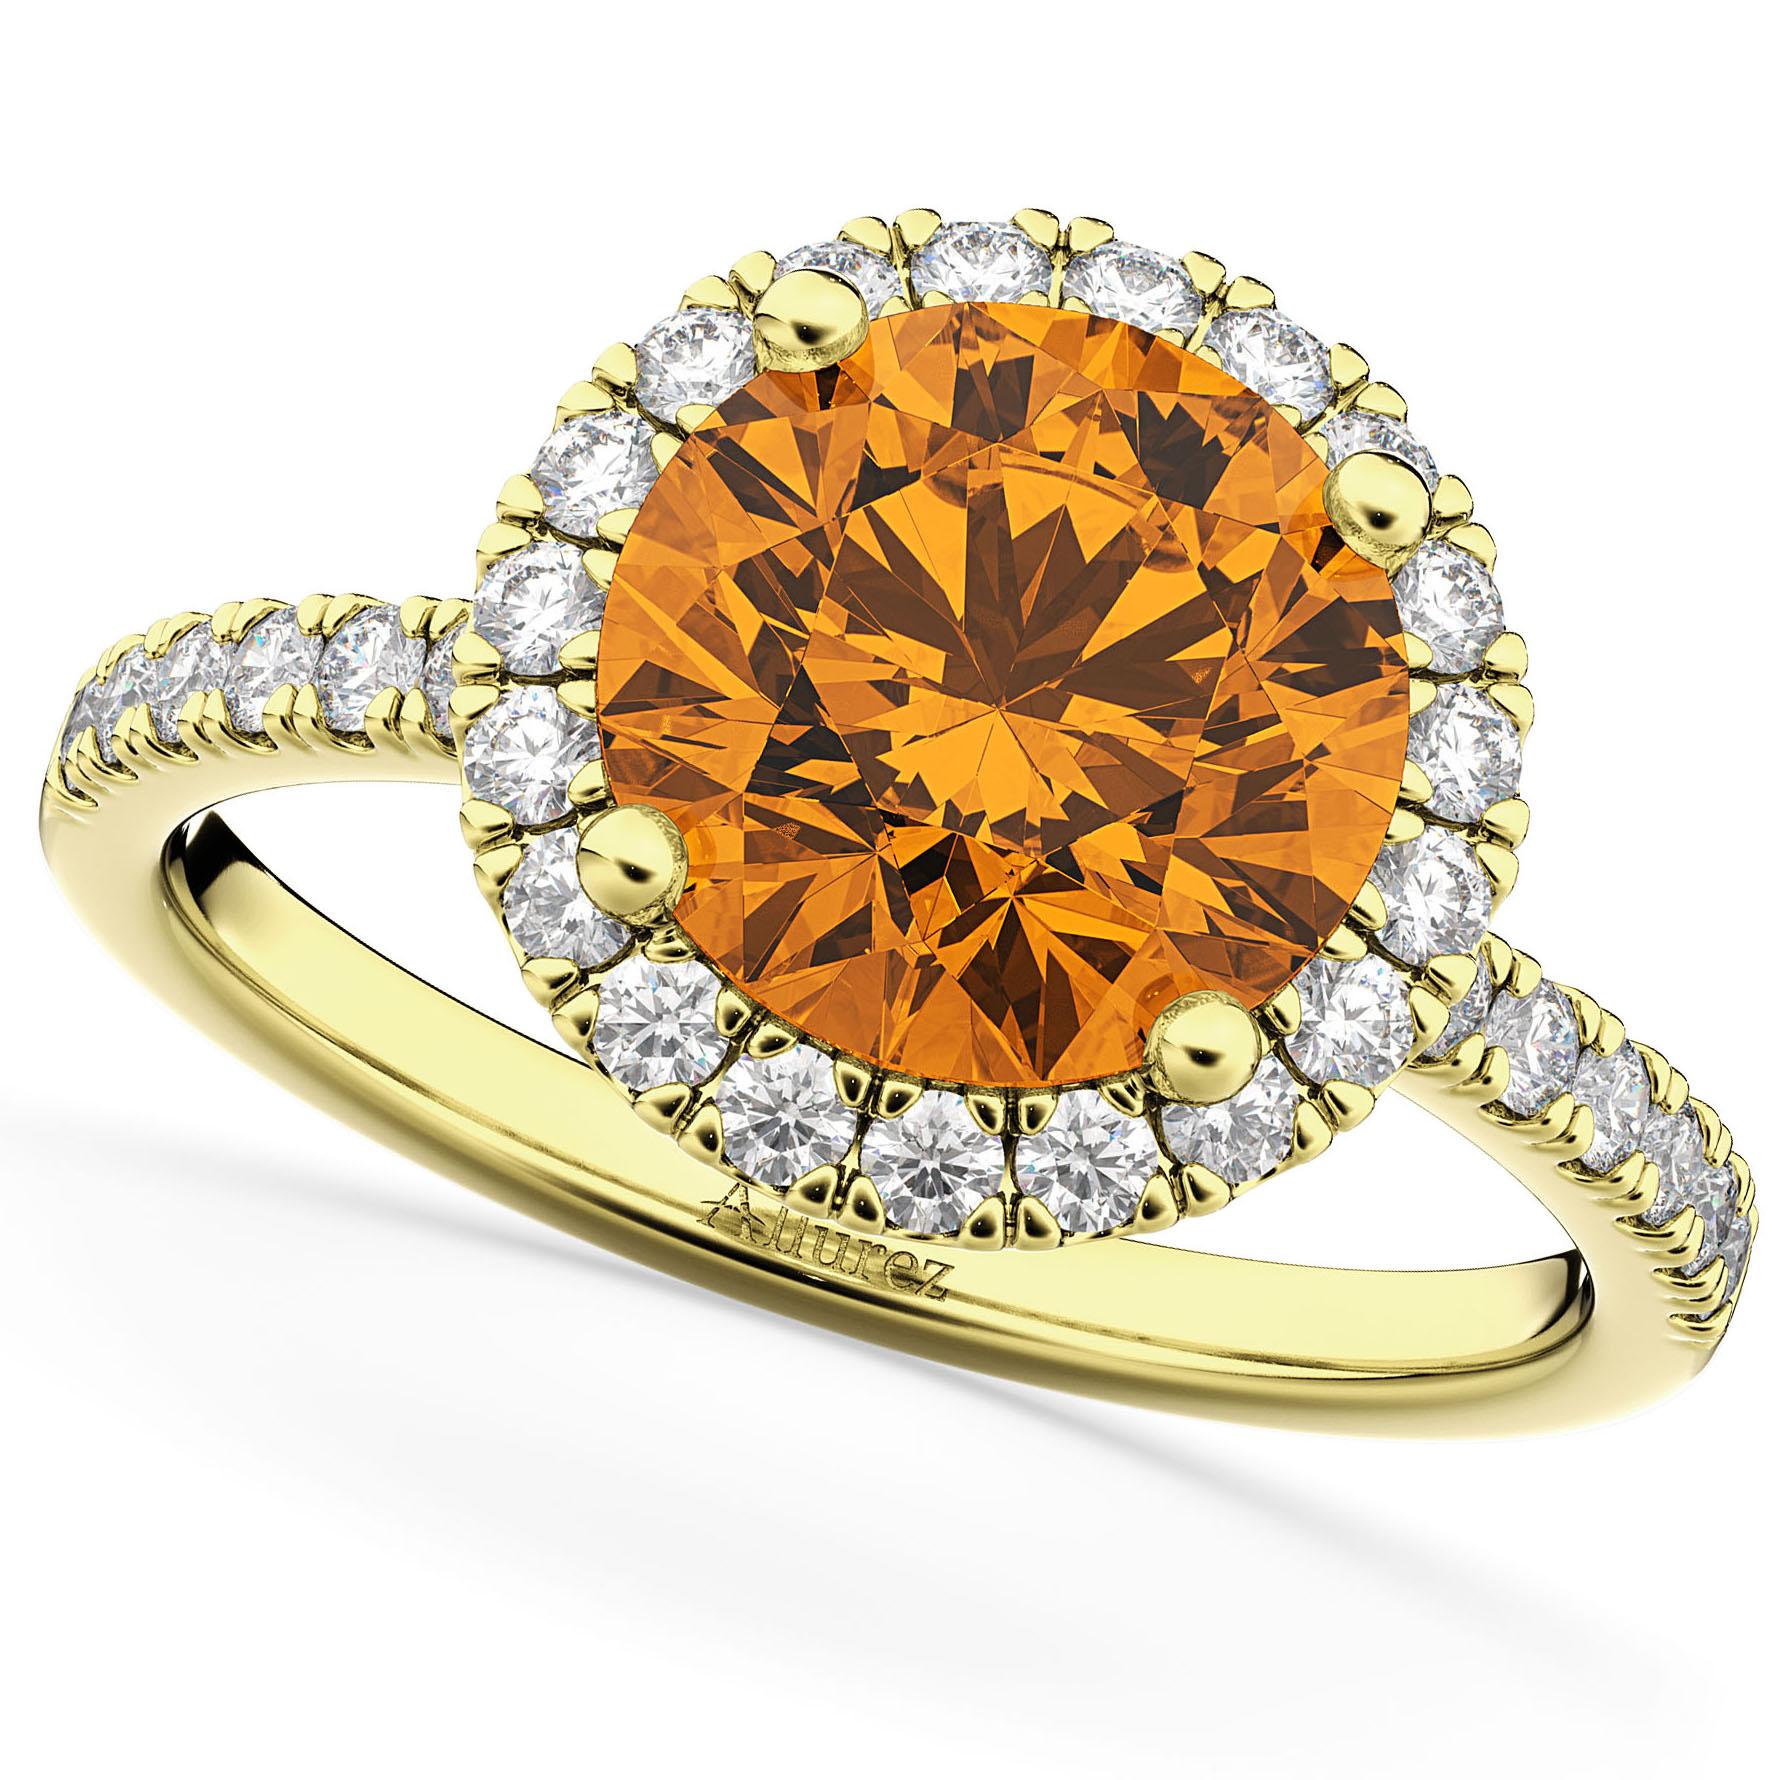 Halo Citrine & Diamond Engagement Ring 14K Yellow Gold 2.30ct